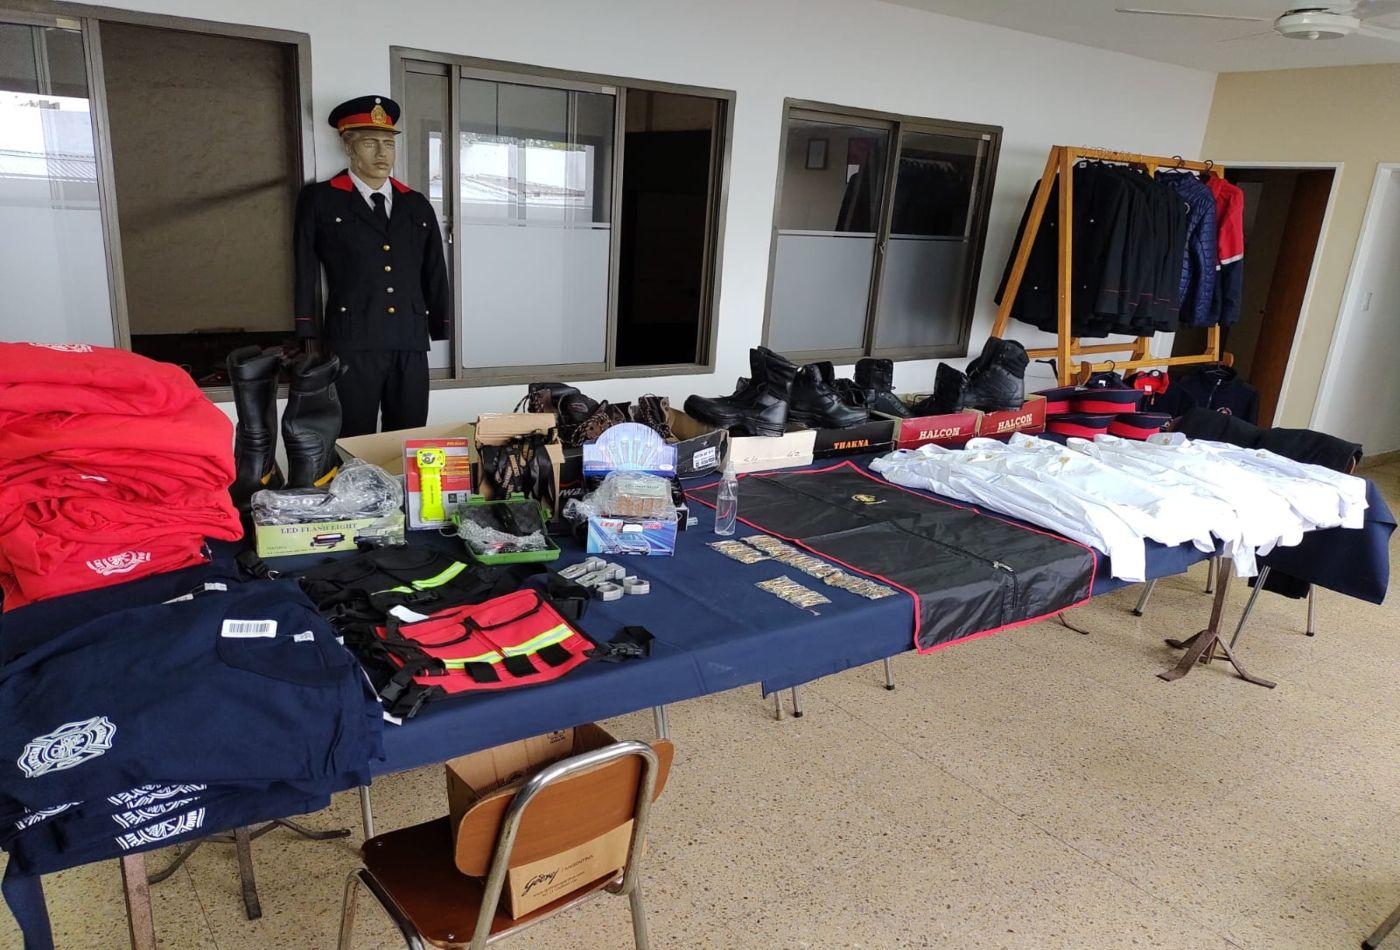 Alguna de las prendas que vende Guido Morral para diferentes servicios.